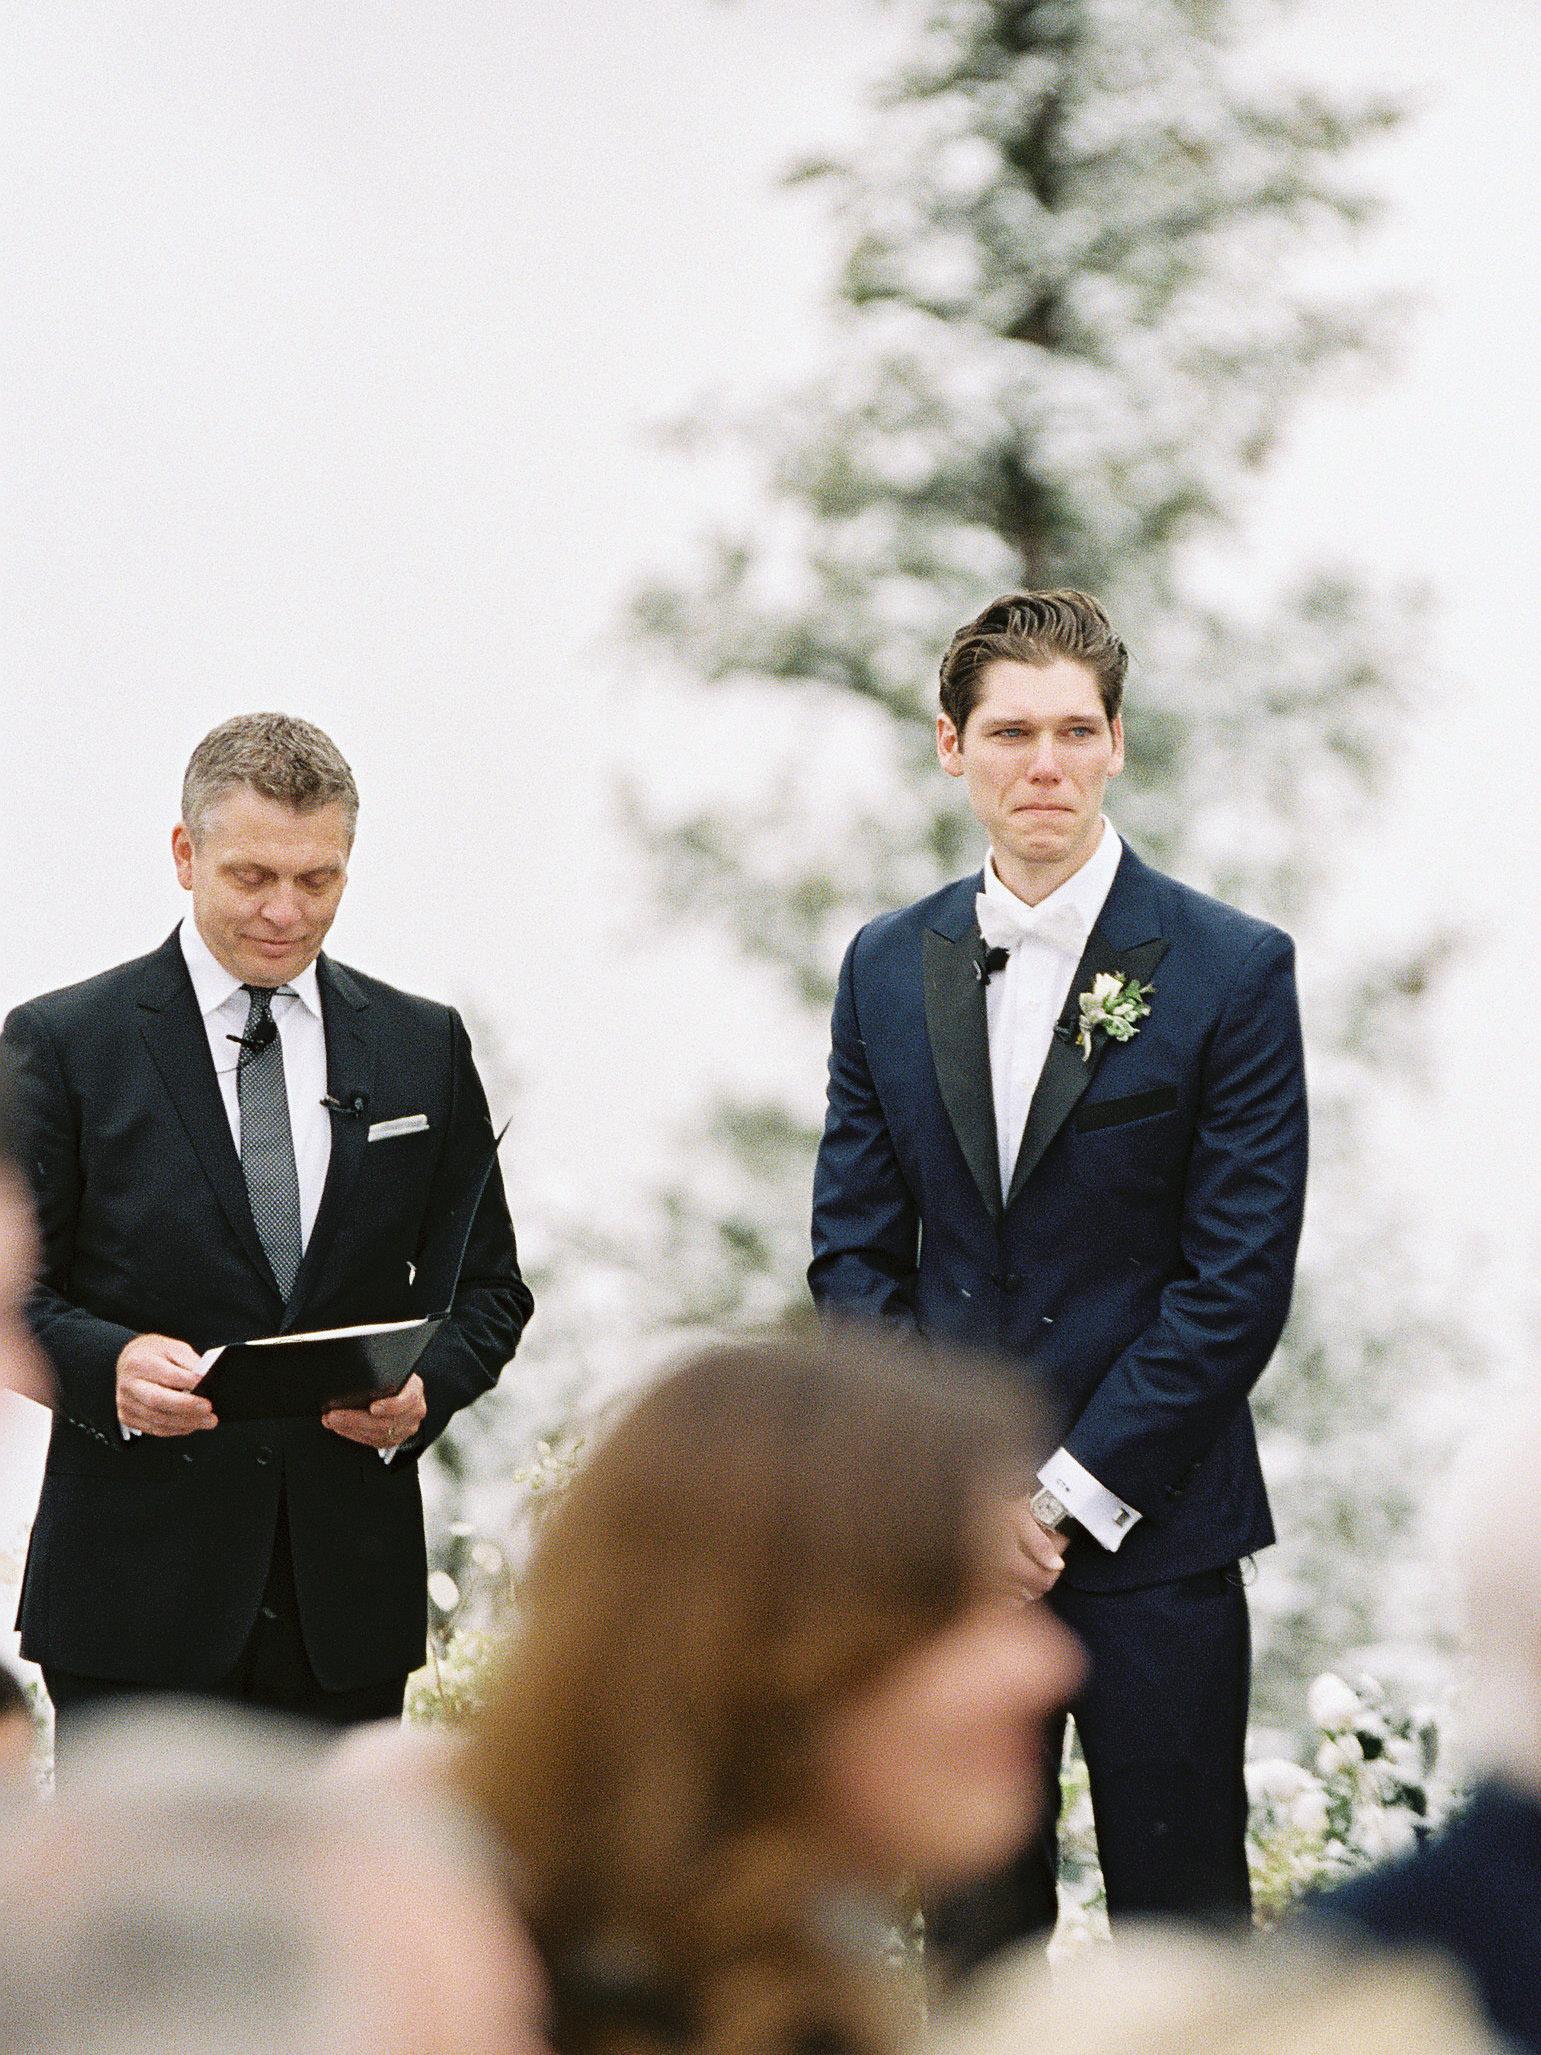 taylor cameron wedding processional